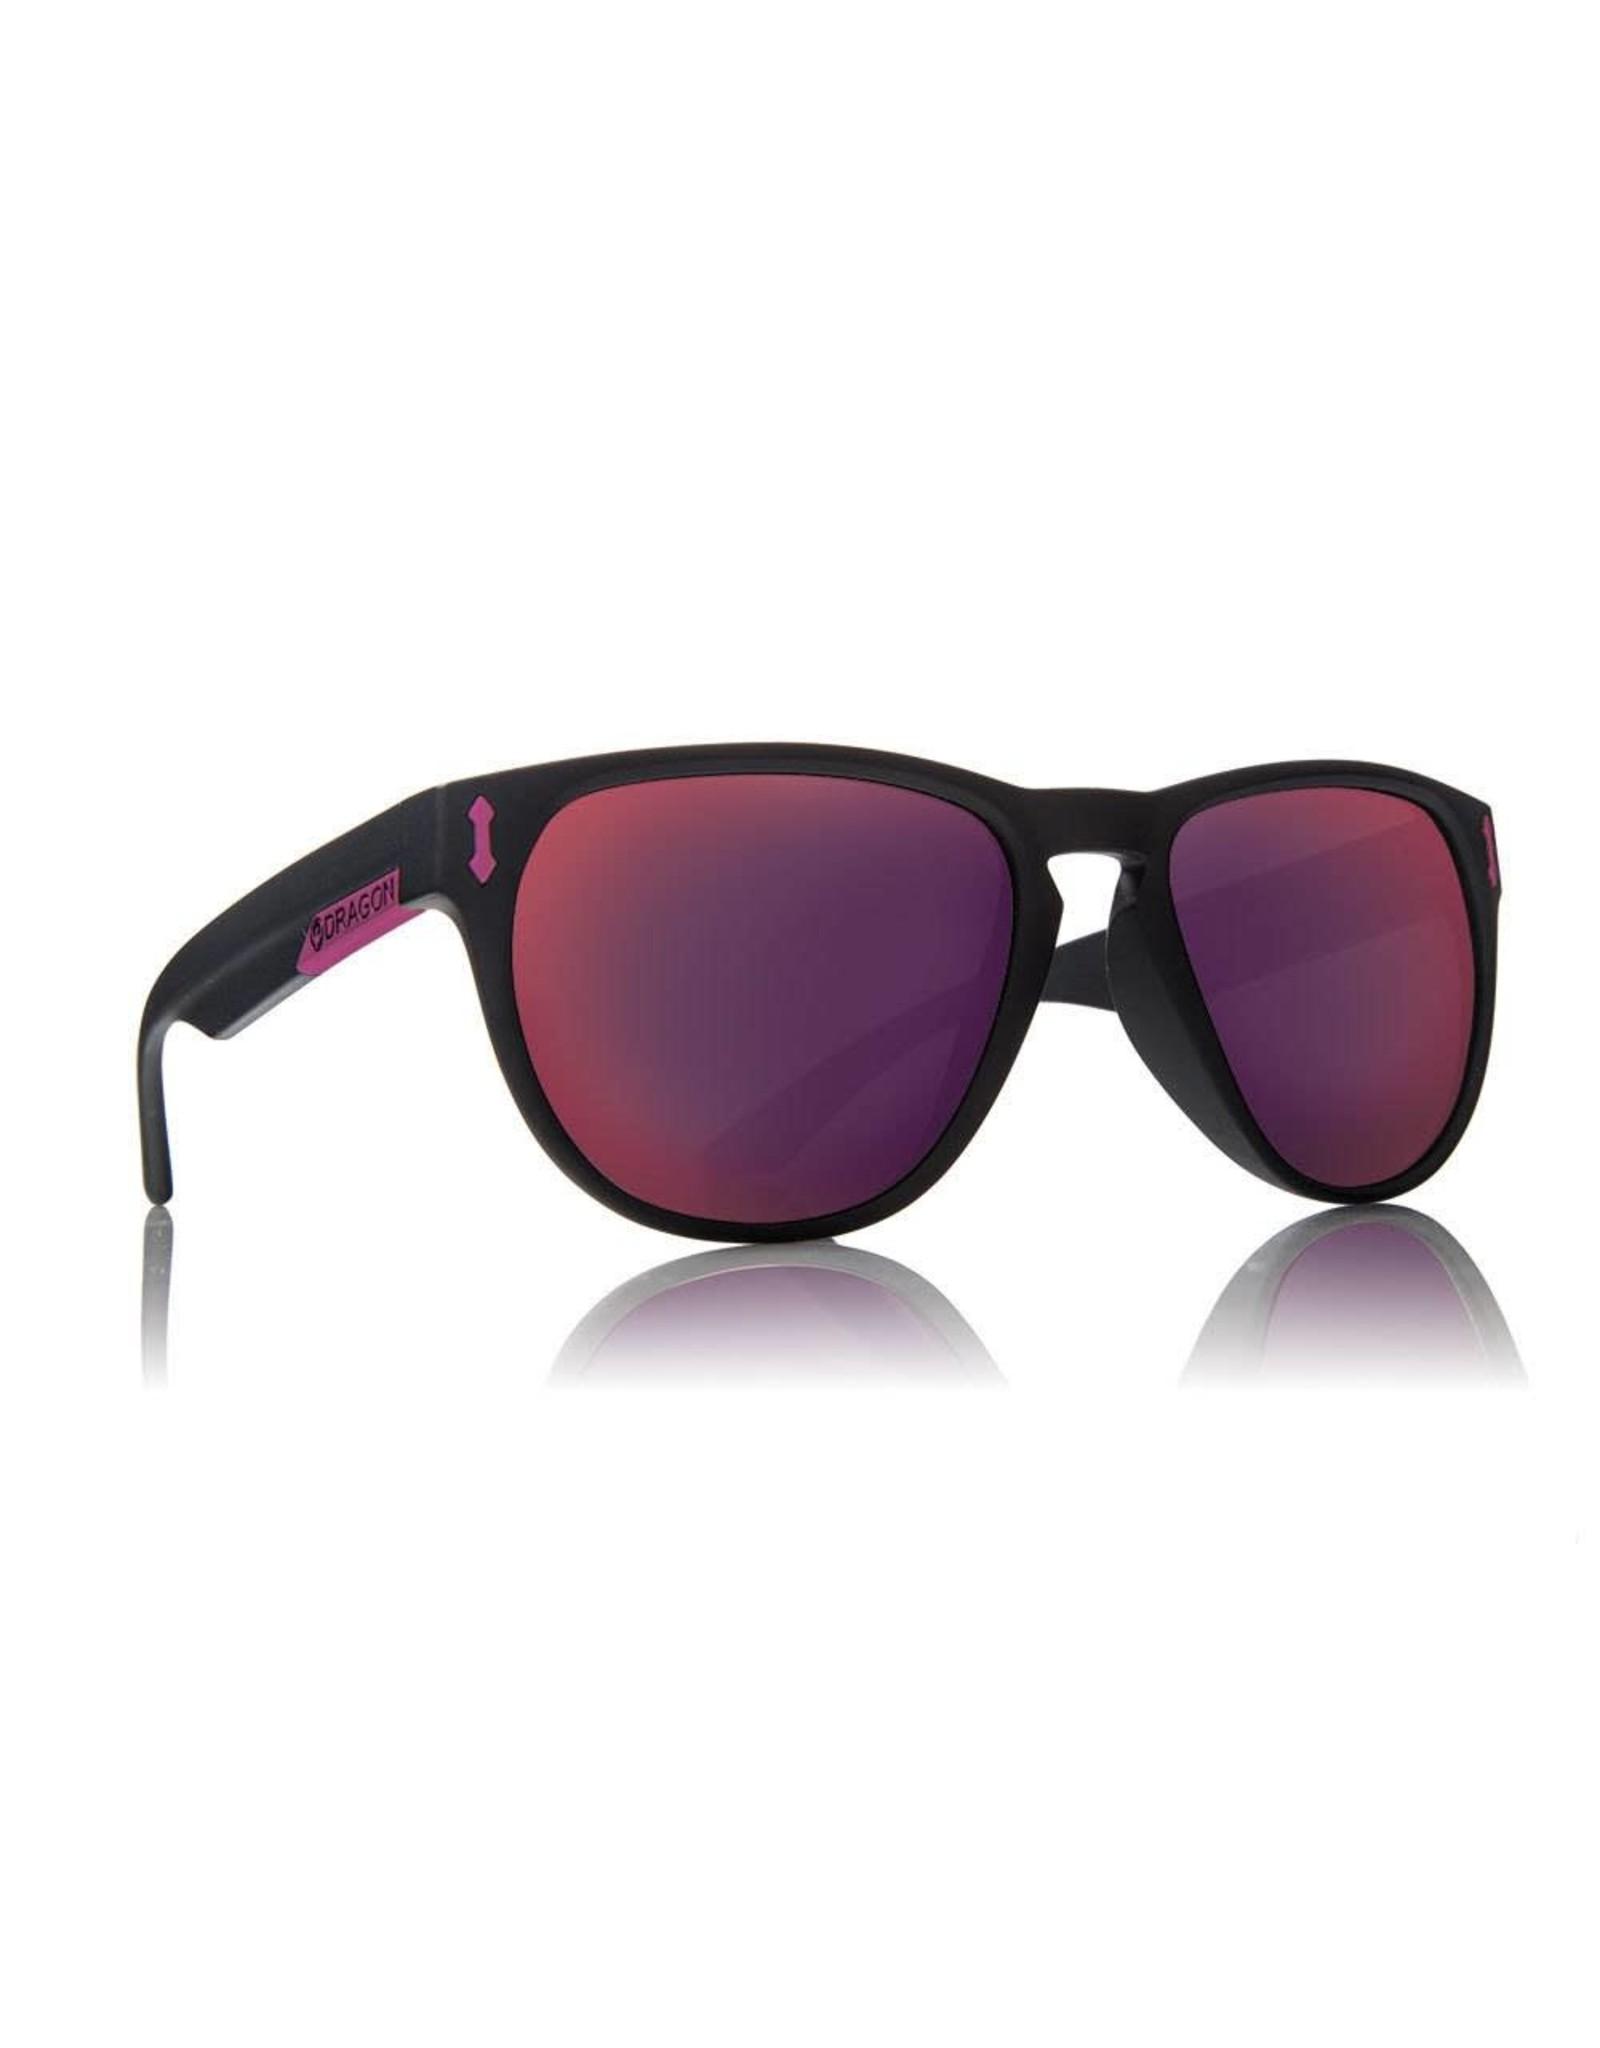 DRAGON Marquis H2O Plasma P2 Sunglasses